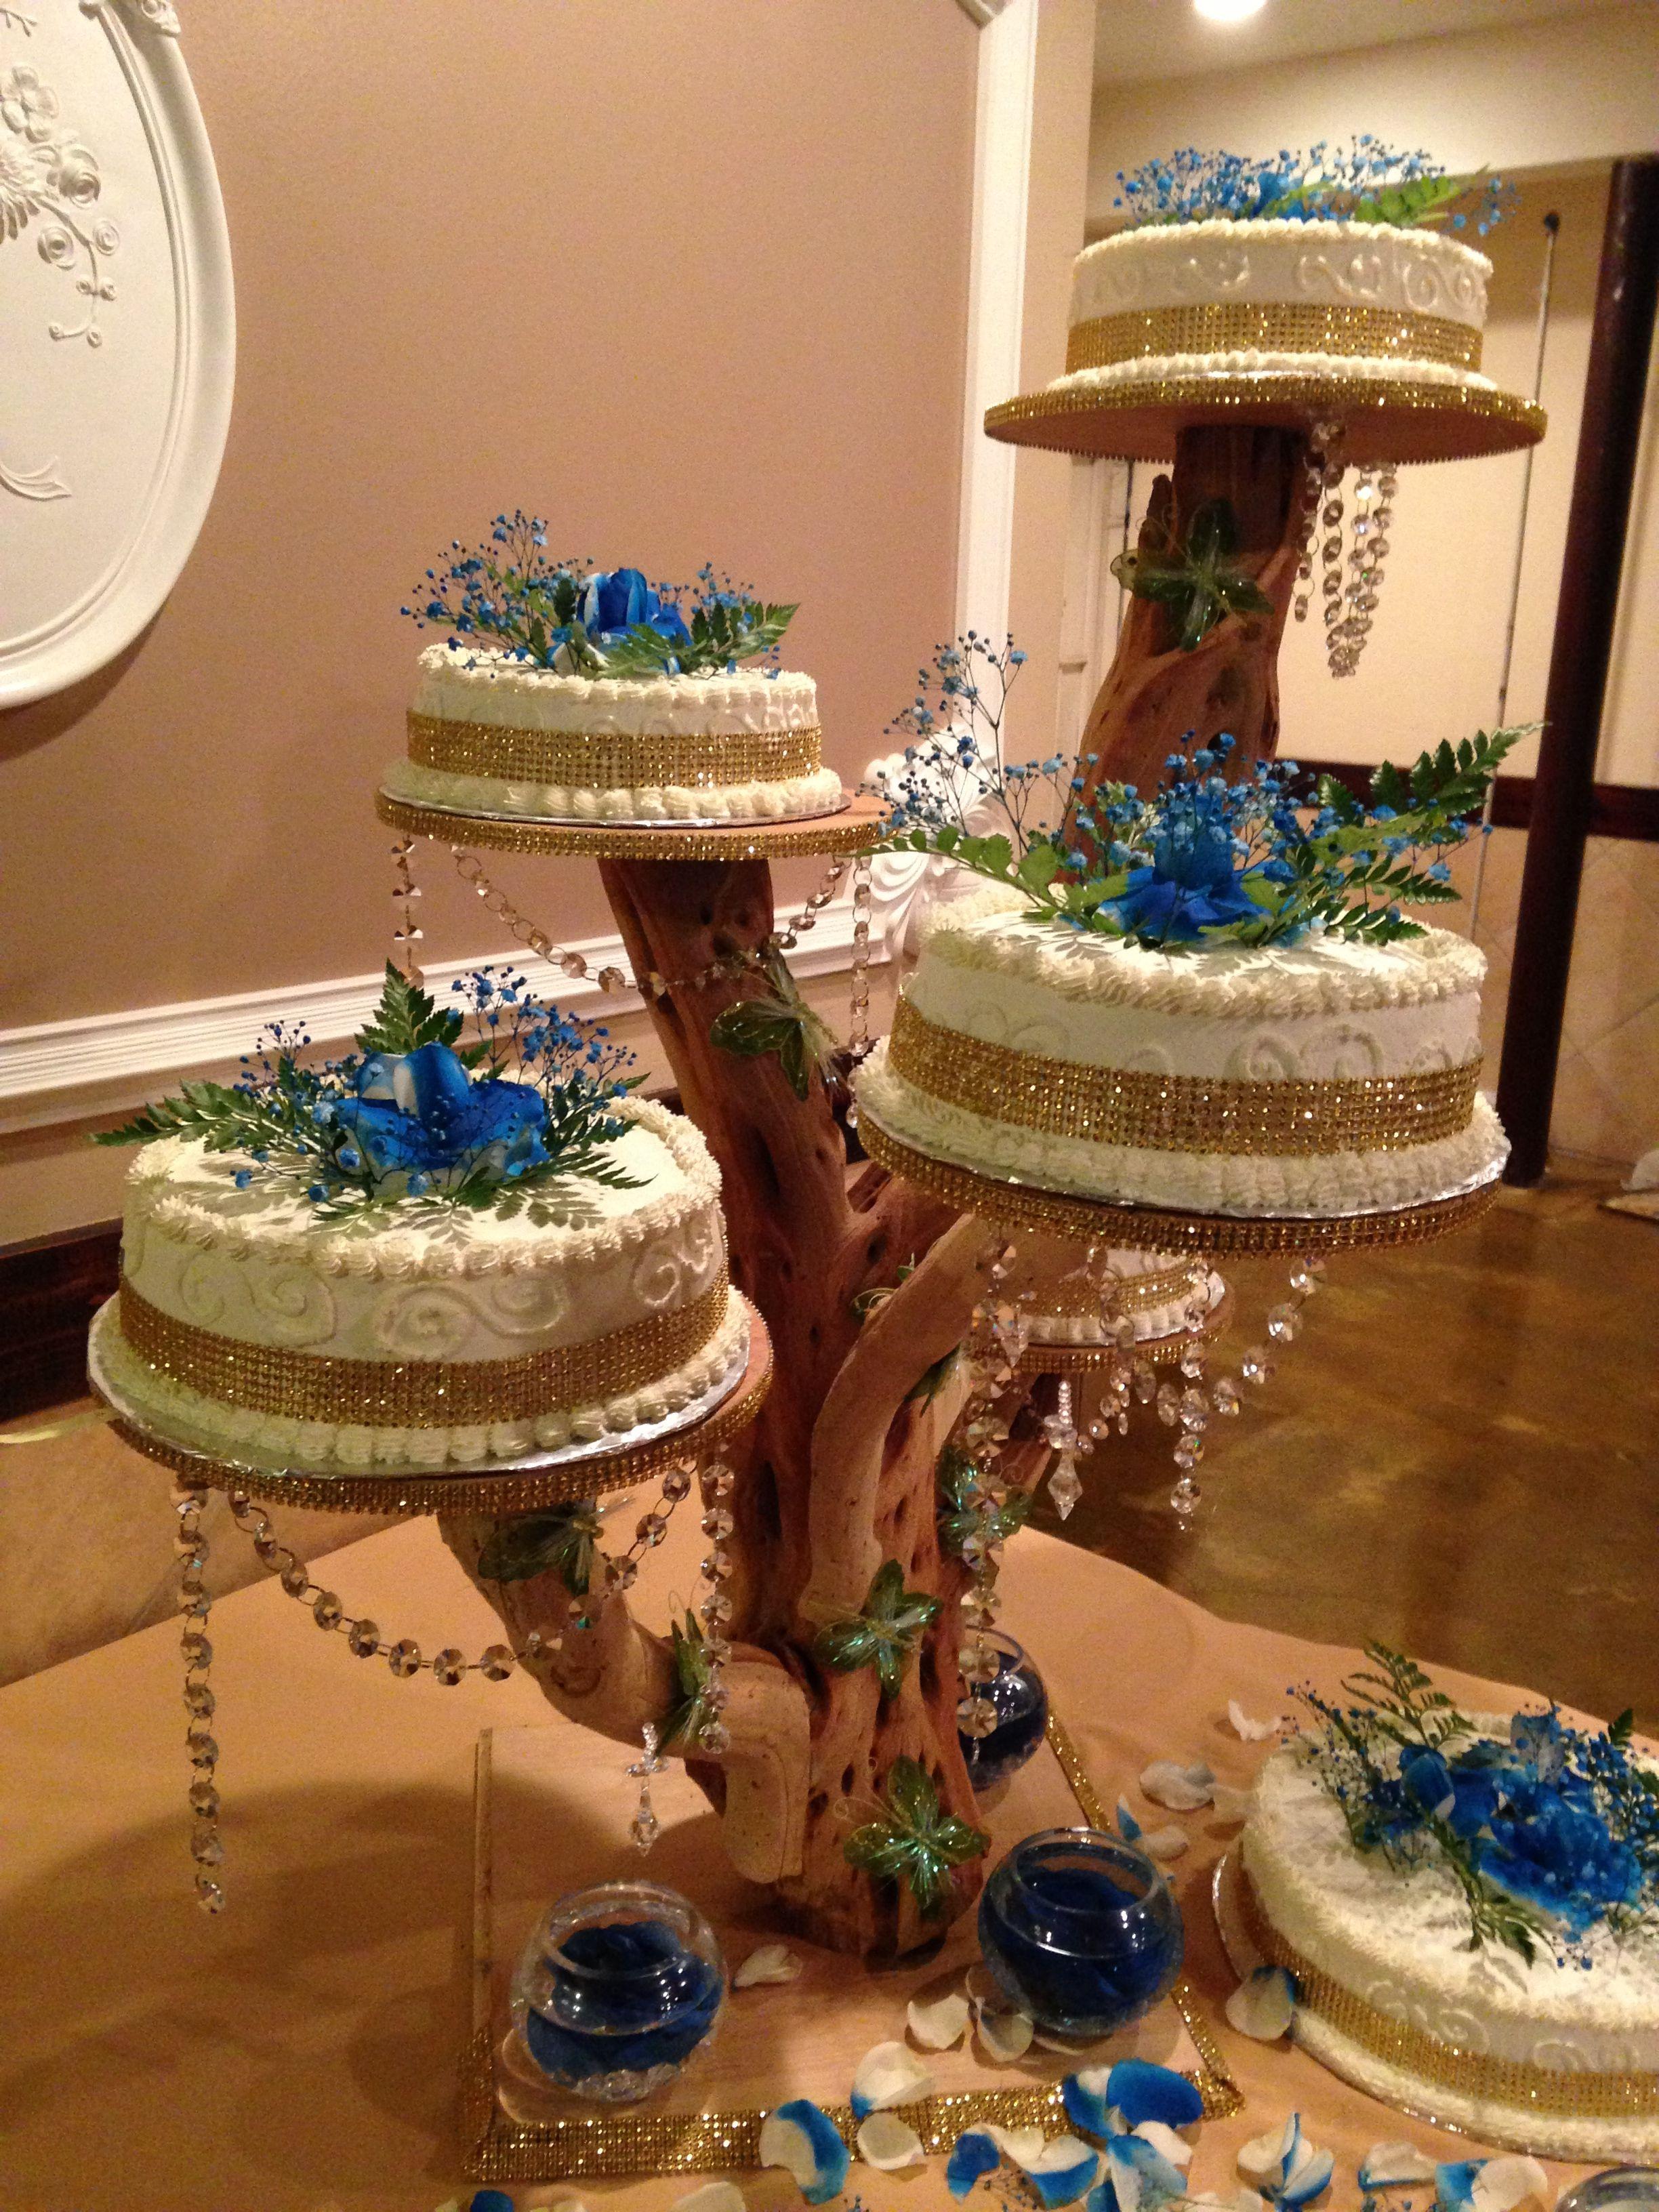 Tree Branch Cake Stand Wedding Cake Idea Quinceanera Cake Made It Myself Wedding Cake Stands Diy Dessert Stand Wedding Cake Rustic